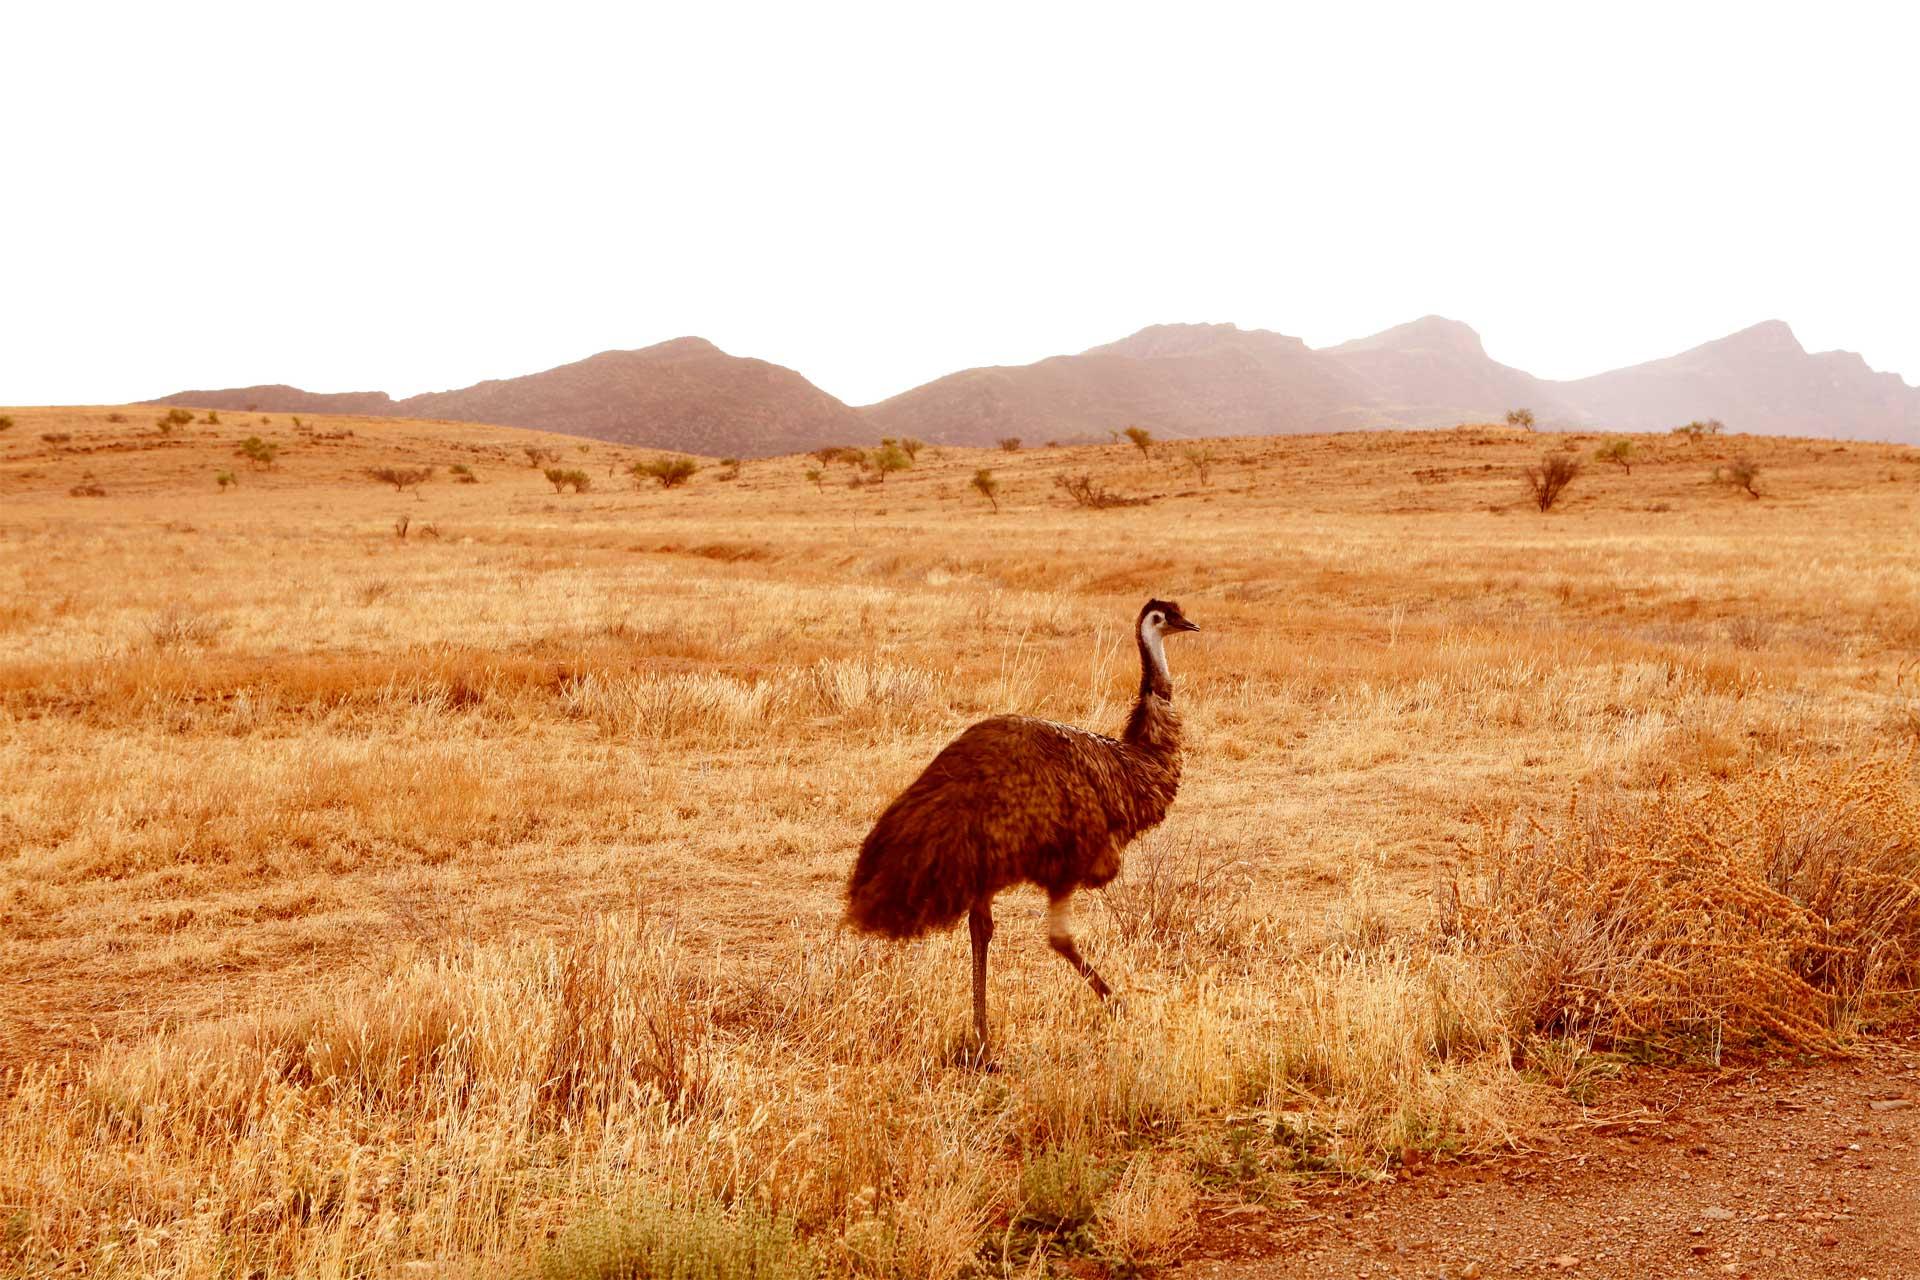 High Resolution Wallpaper | Flinders Ranges 1920x1280 px